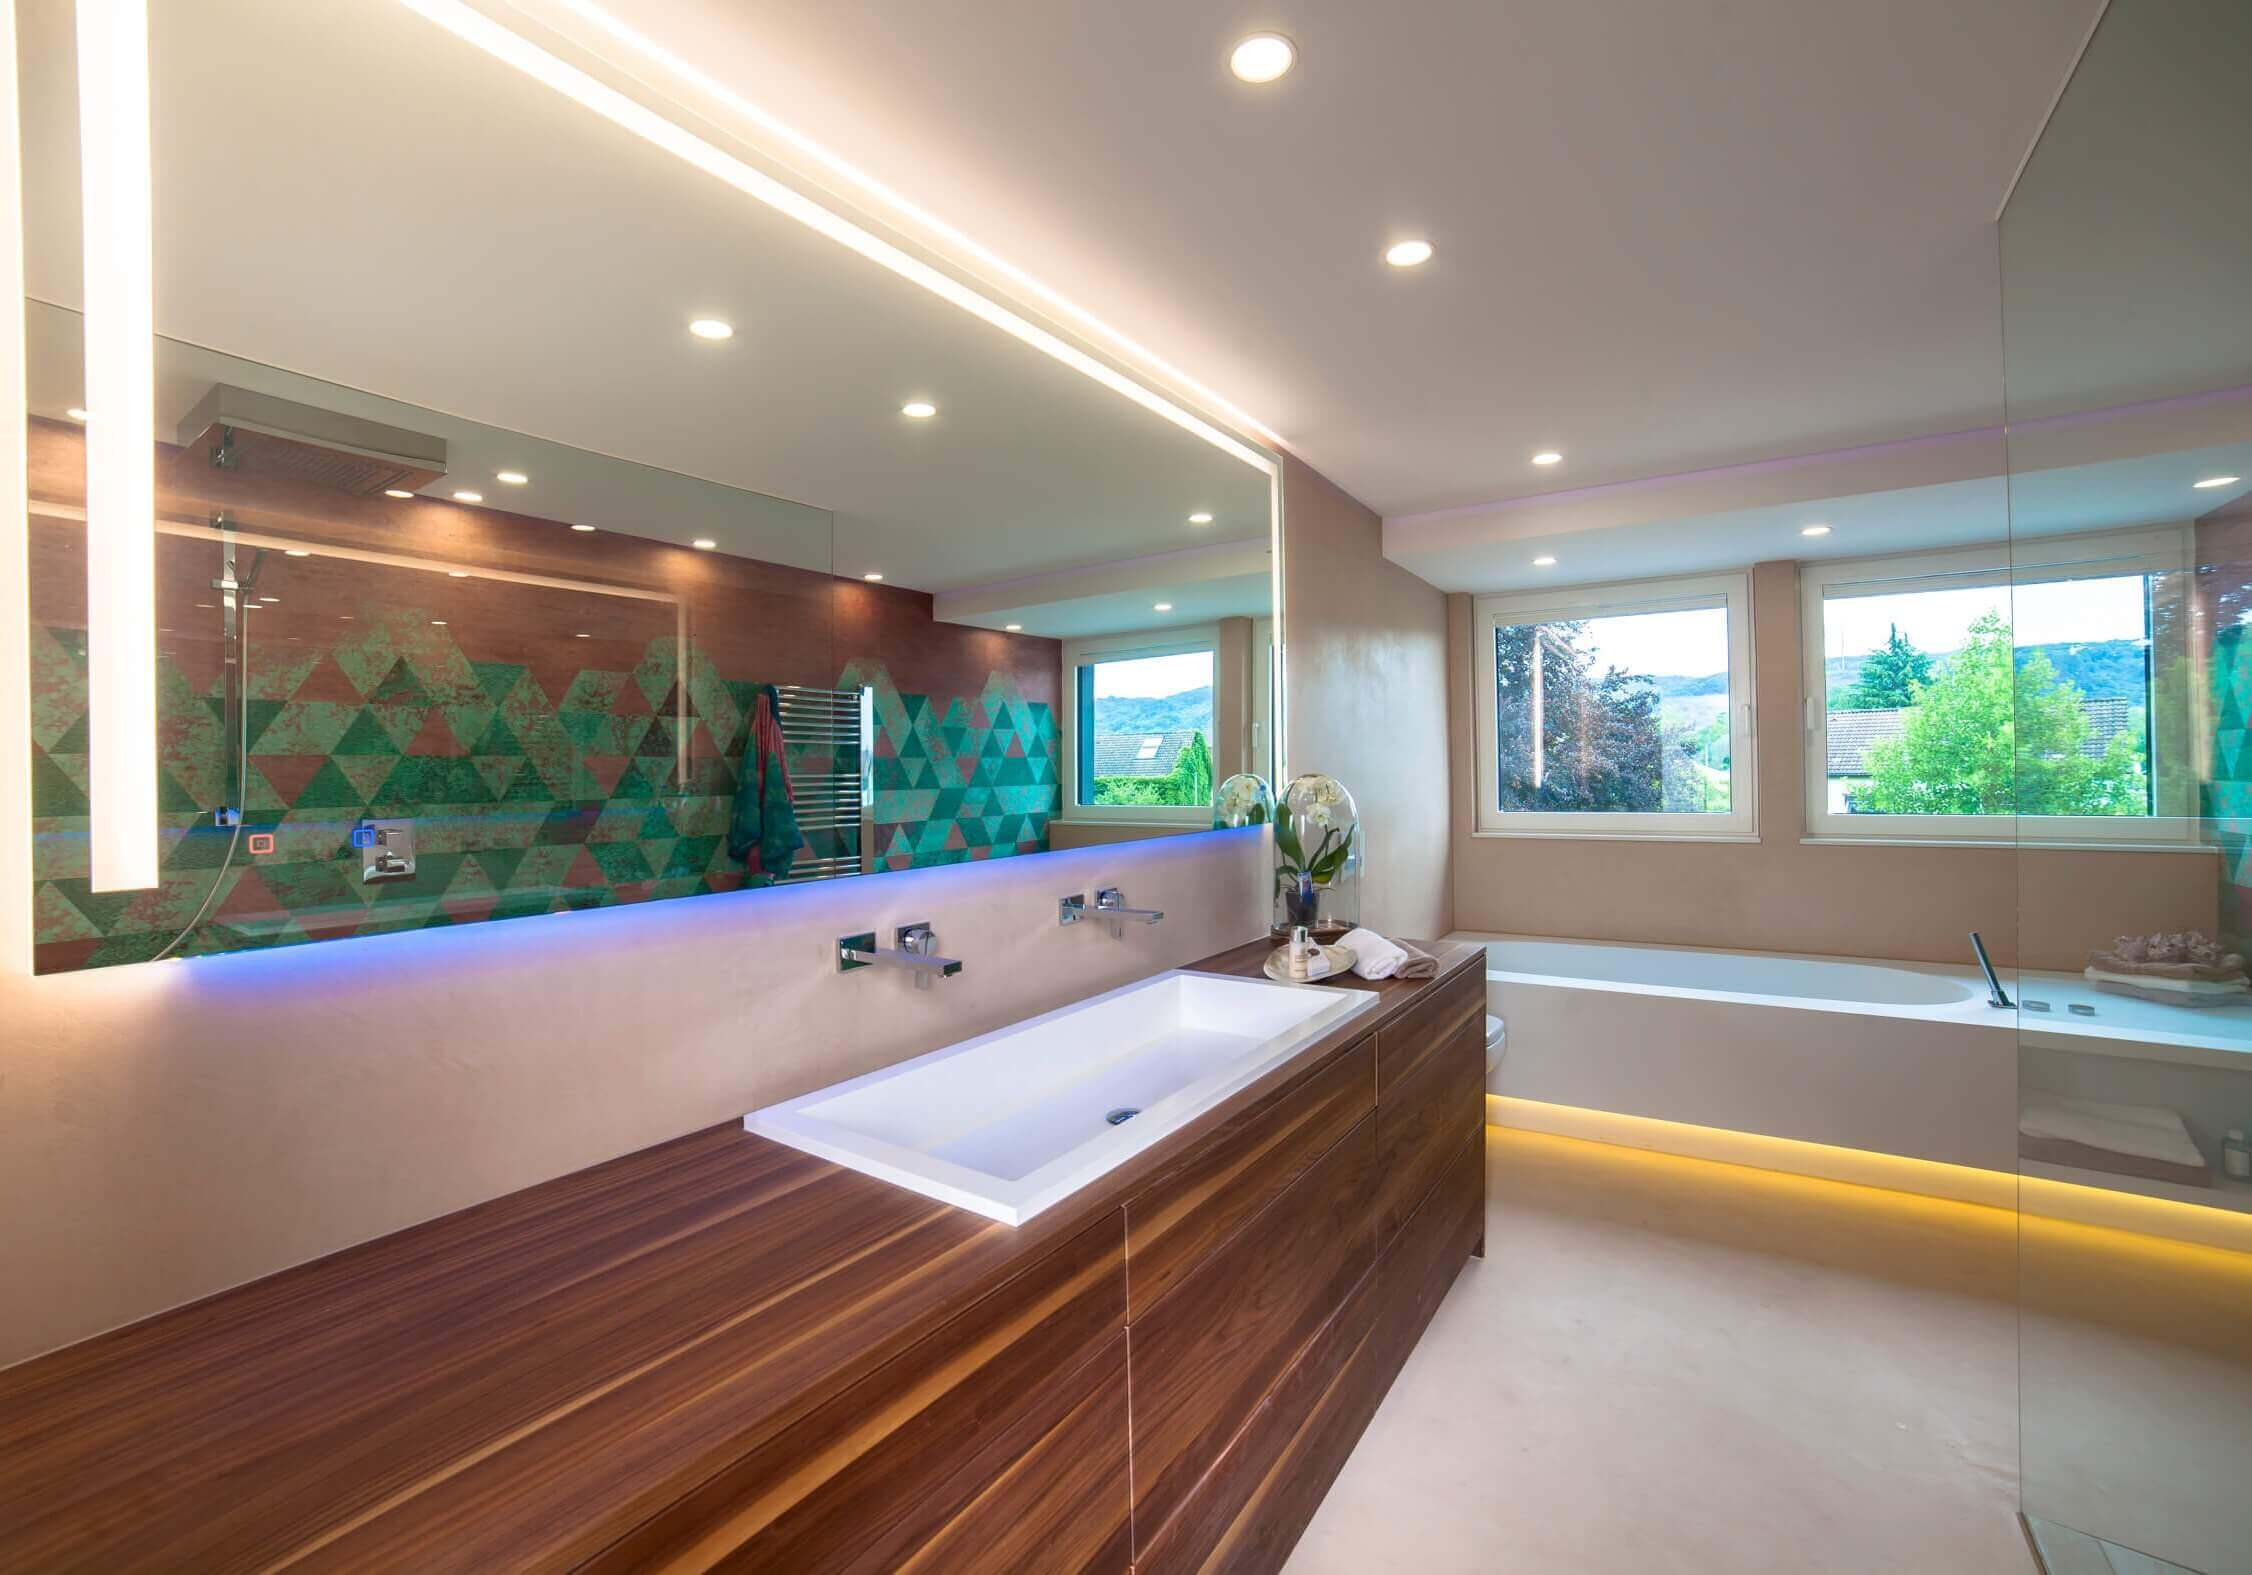 badezimmer trends 2019 trends 2019 k che und badezimmer. Black Bedroom Furniture Sets. Home Design Ideas